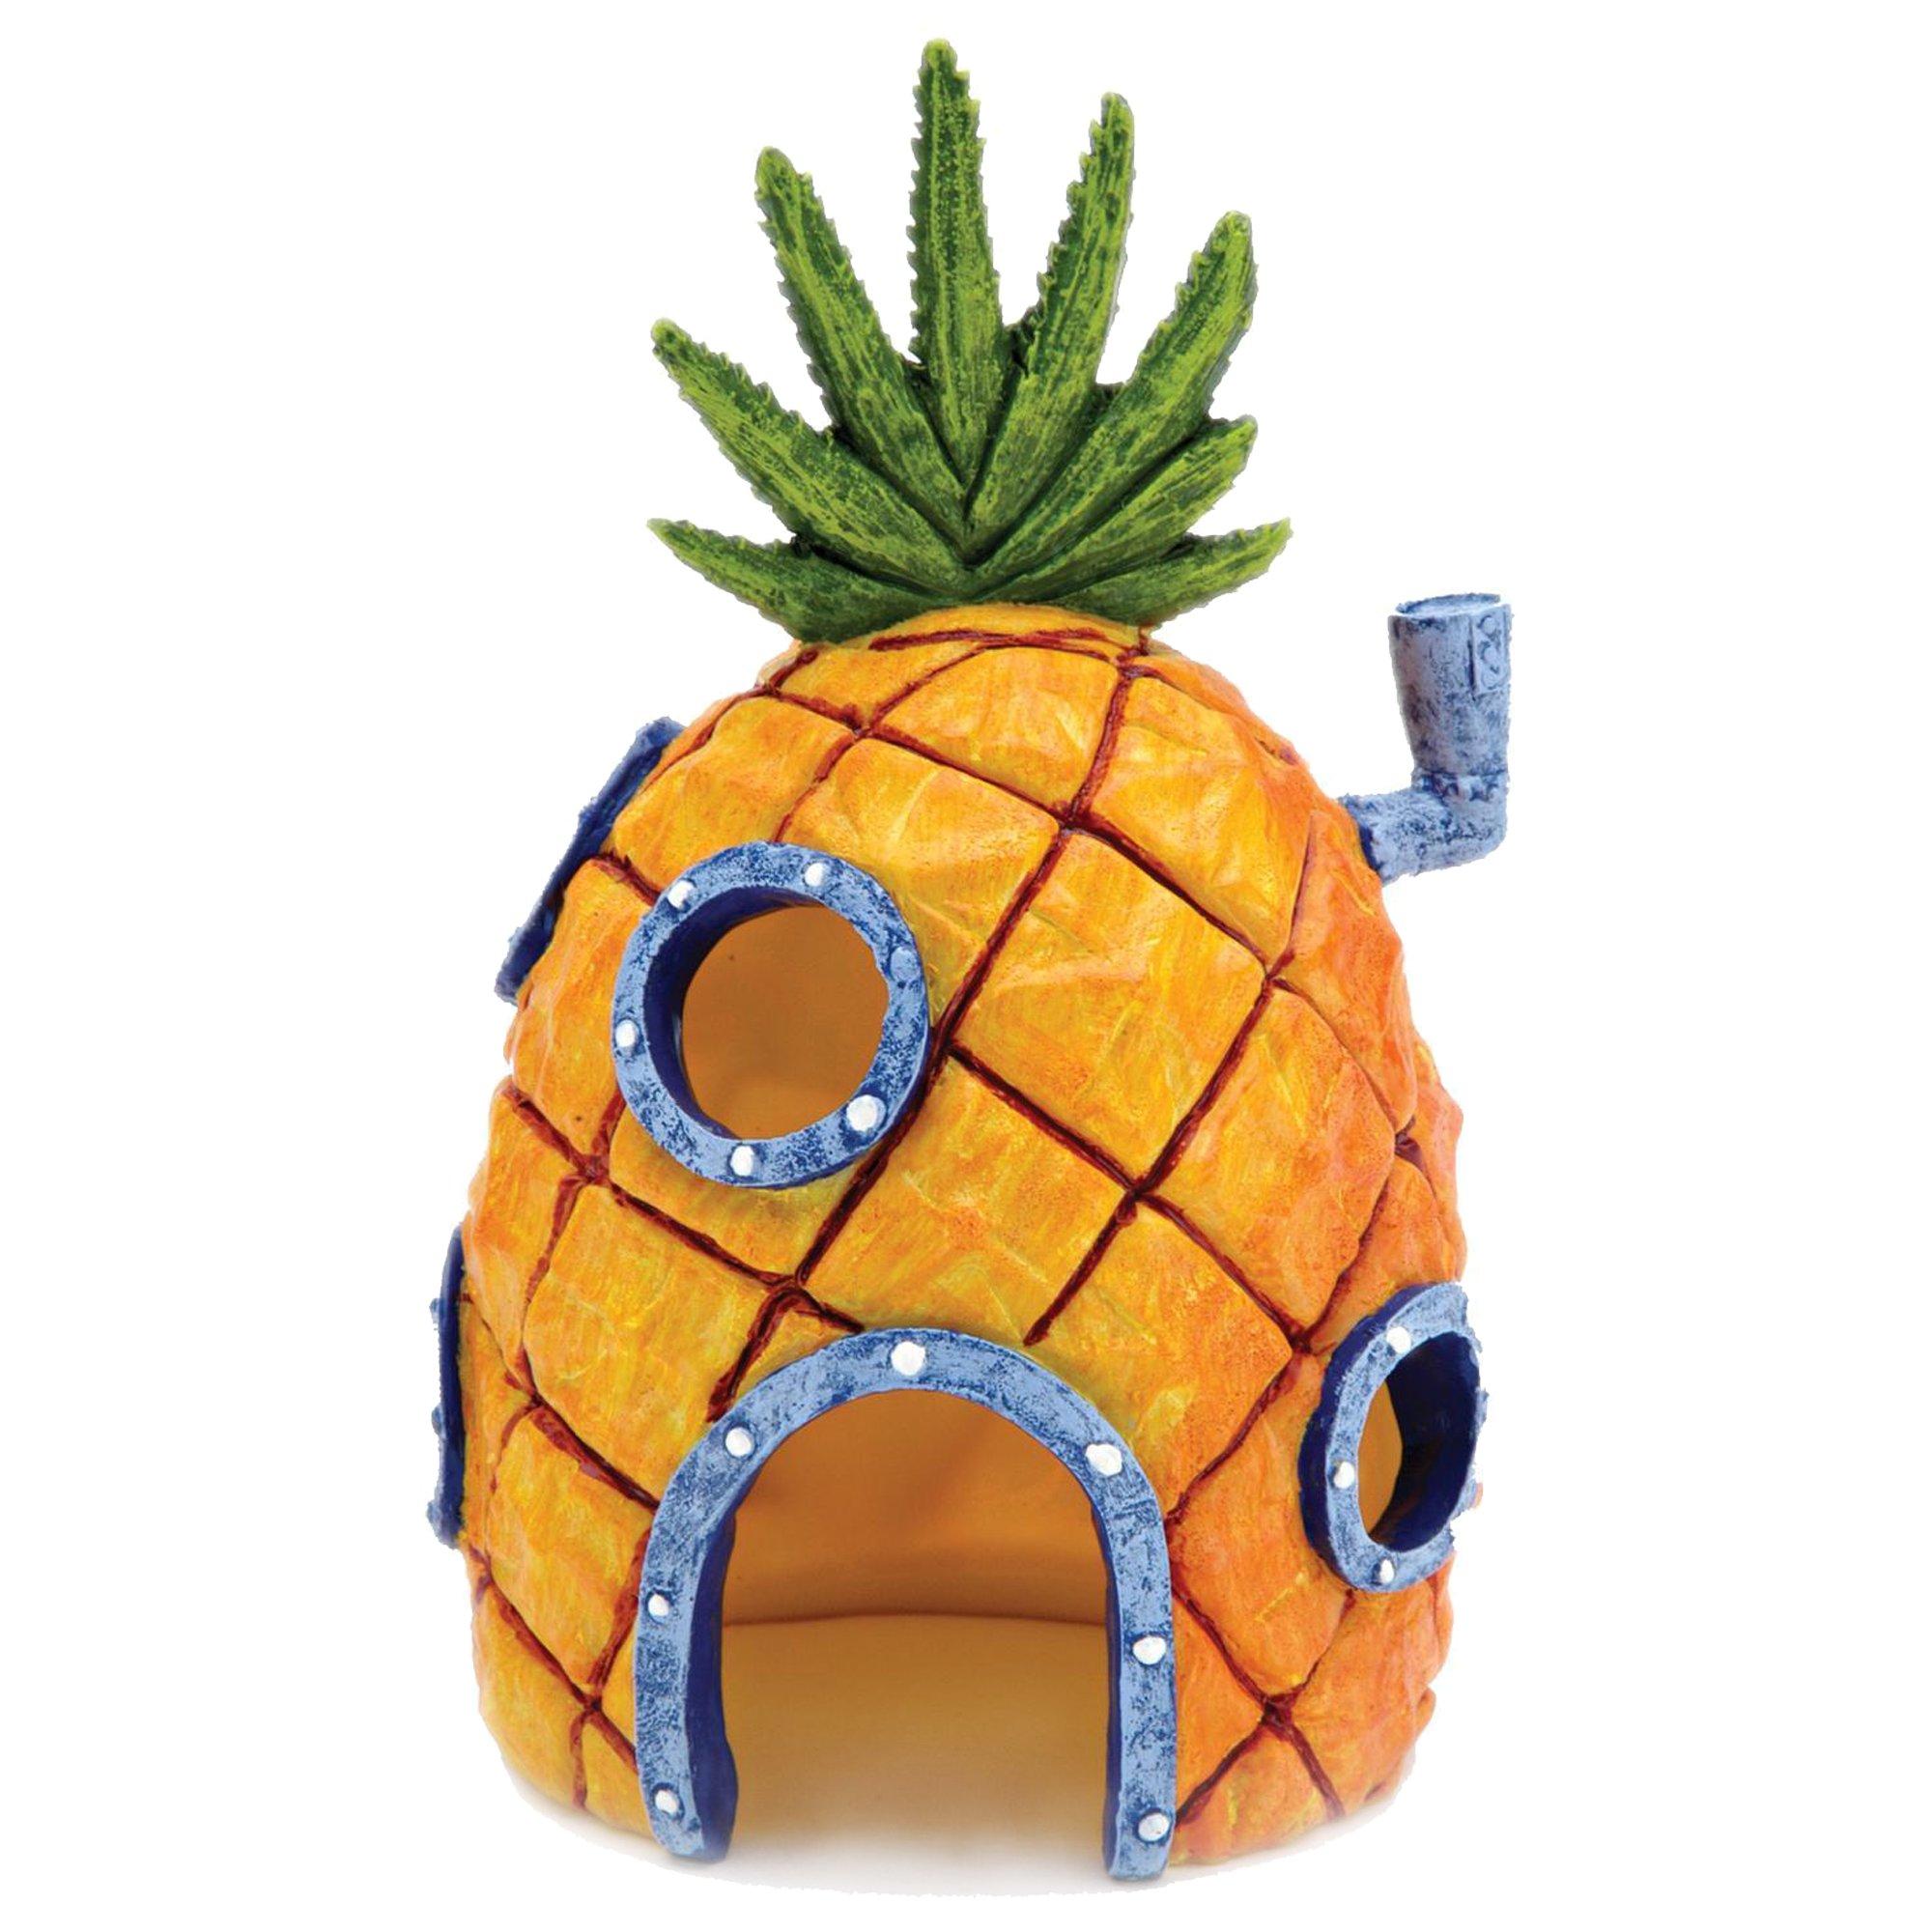 Penn plax spongebob squarepants pineapple house with swim for Petco fish tank decor